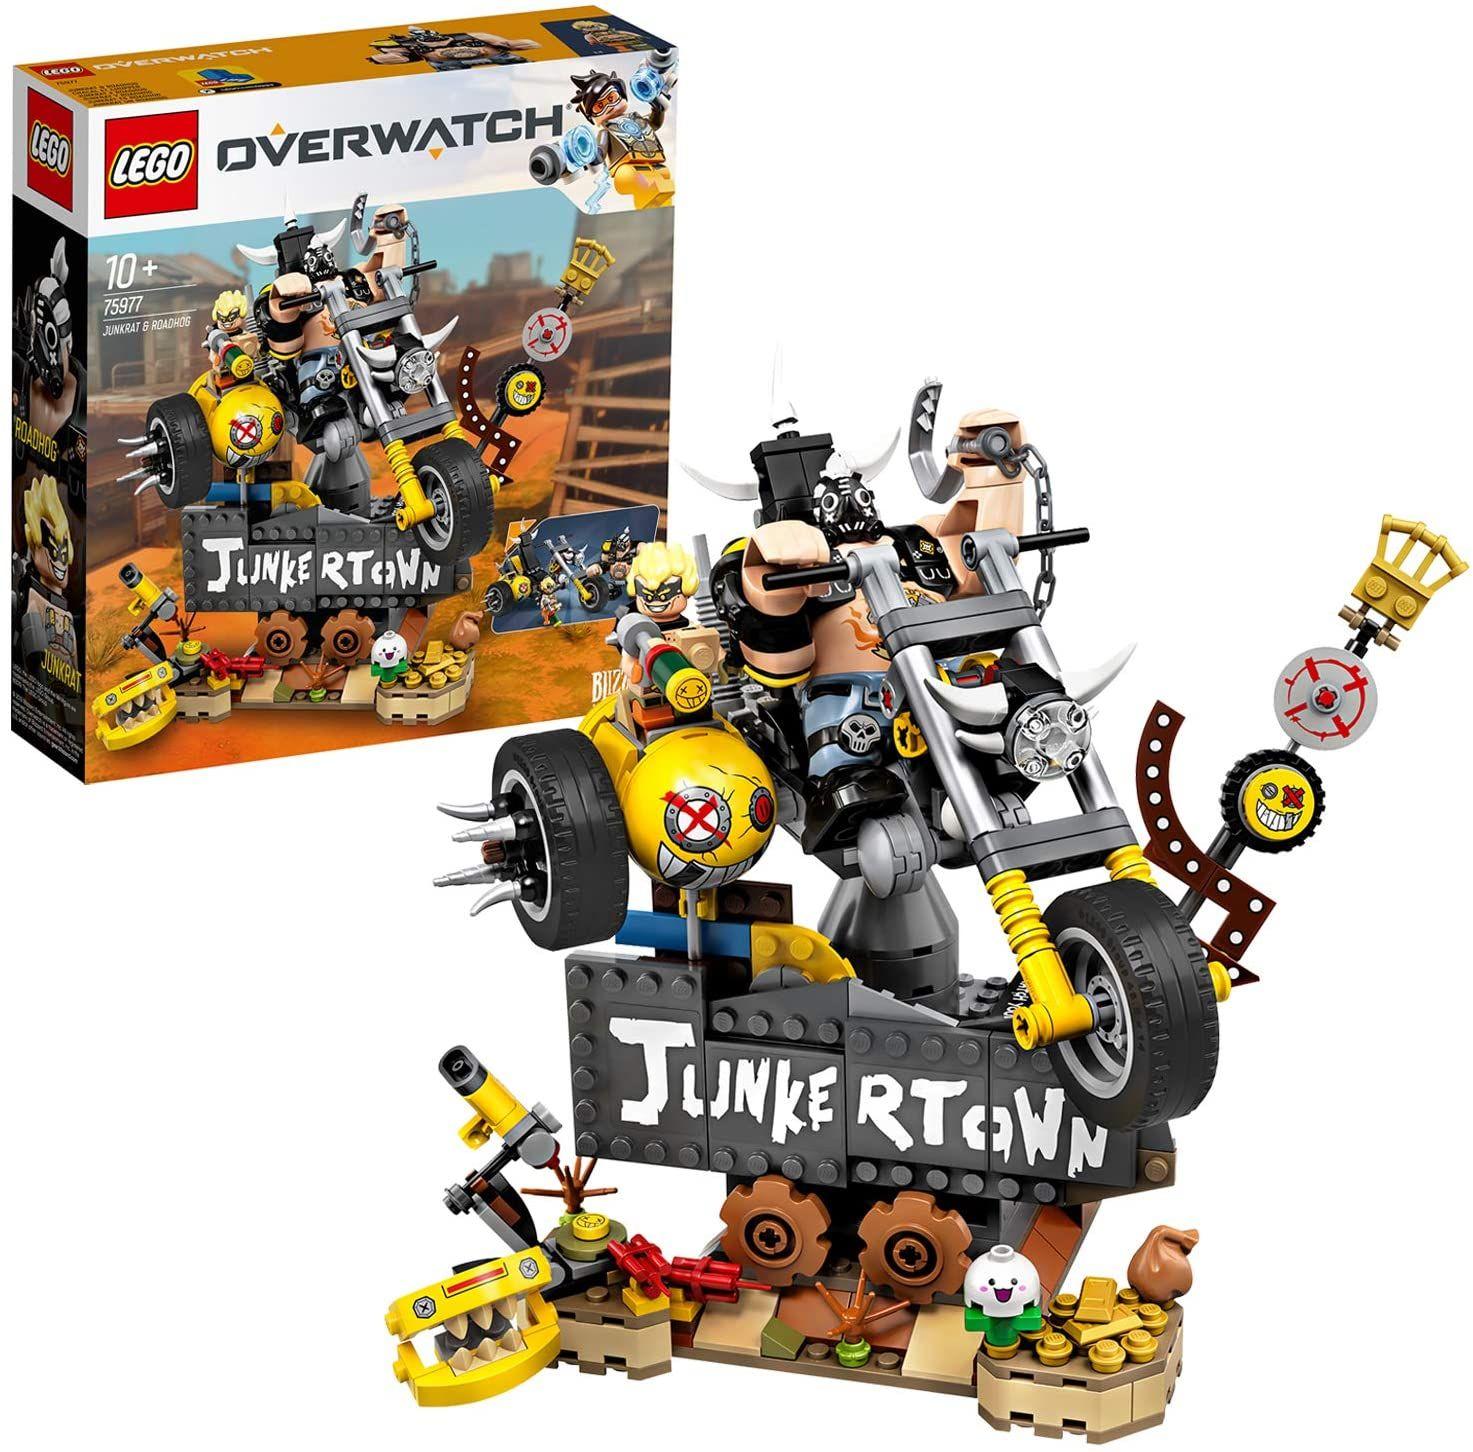 Jouet LEGO Overwatch 75977 - Chacal et Chopper (Via coupon)